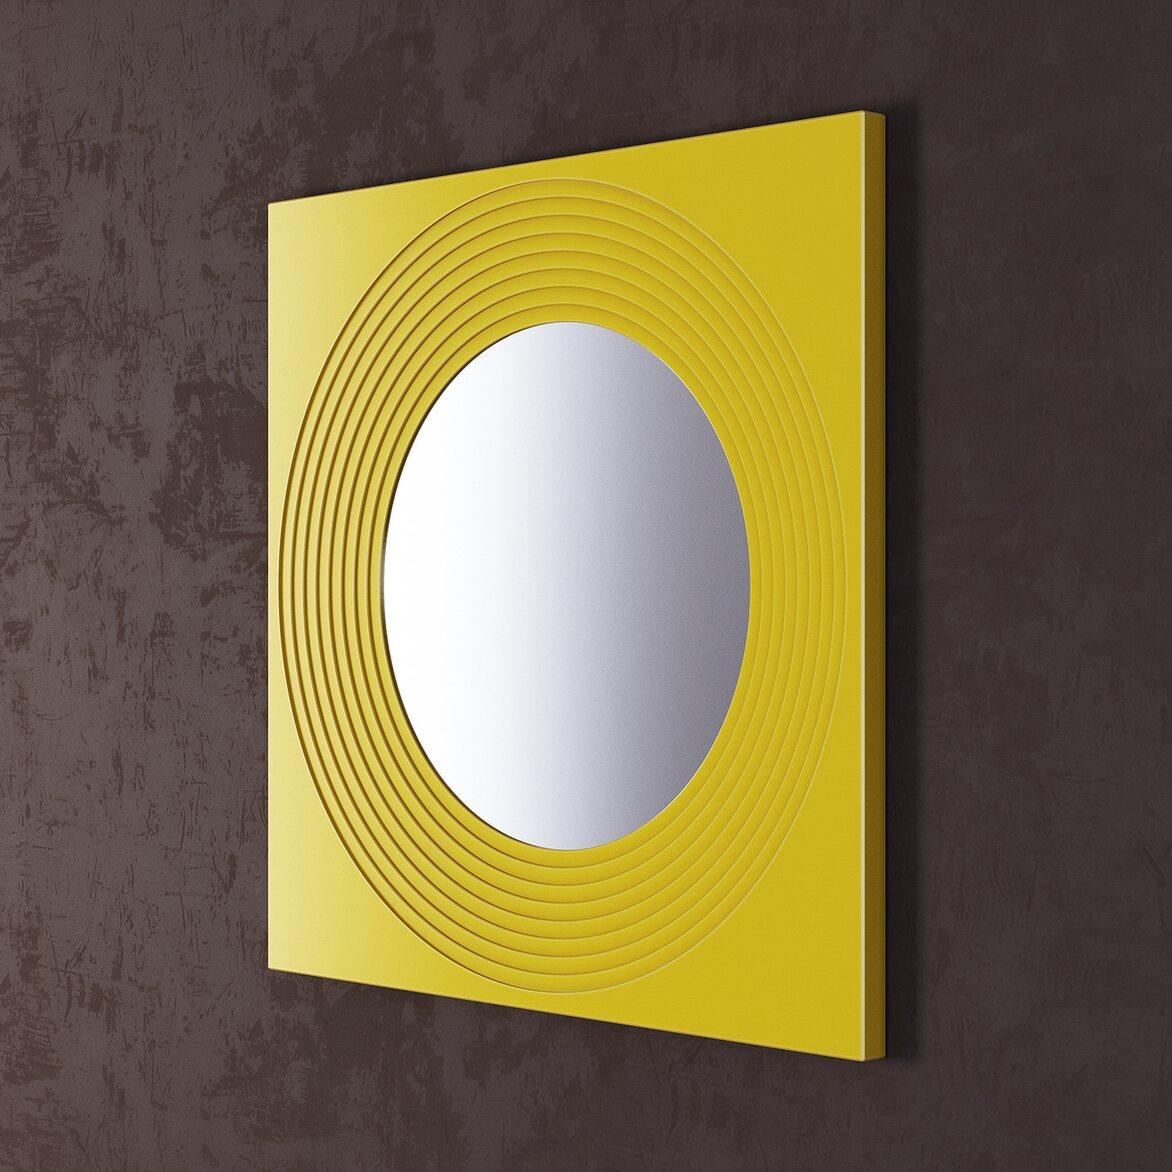 Зеркало Town Yellow 2 | Настенные зеркала Kingsby